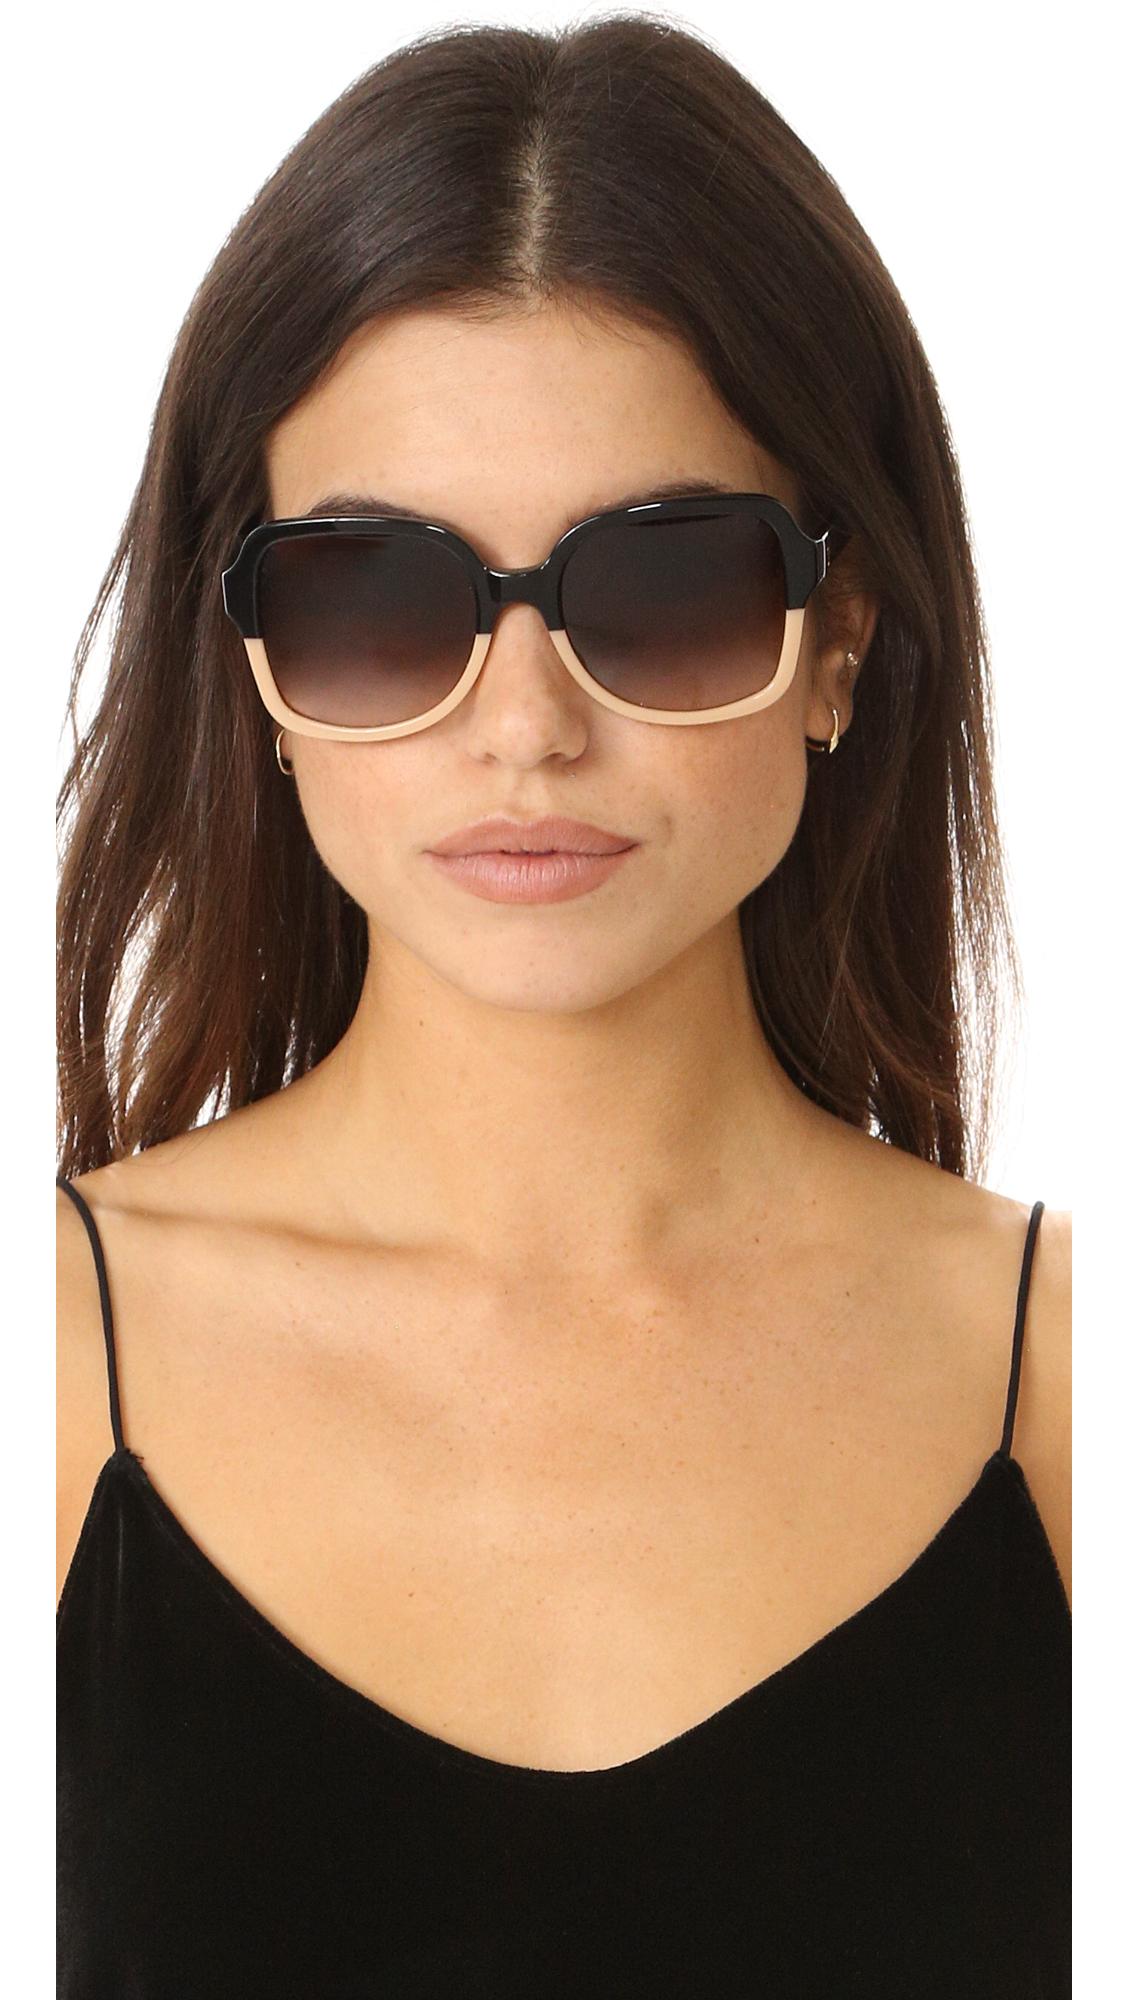 e8a43efede9 Tory Burch Panama Sunglasses